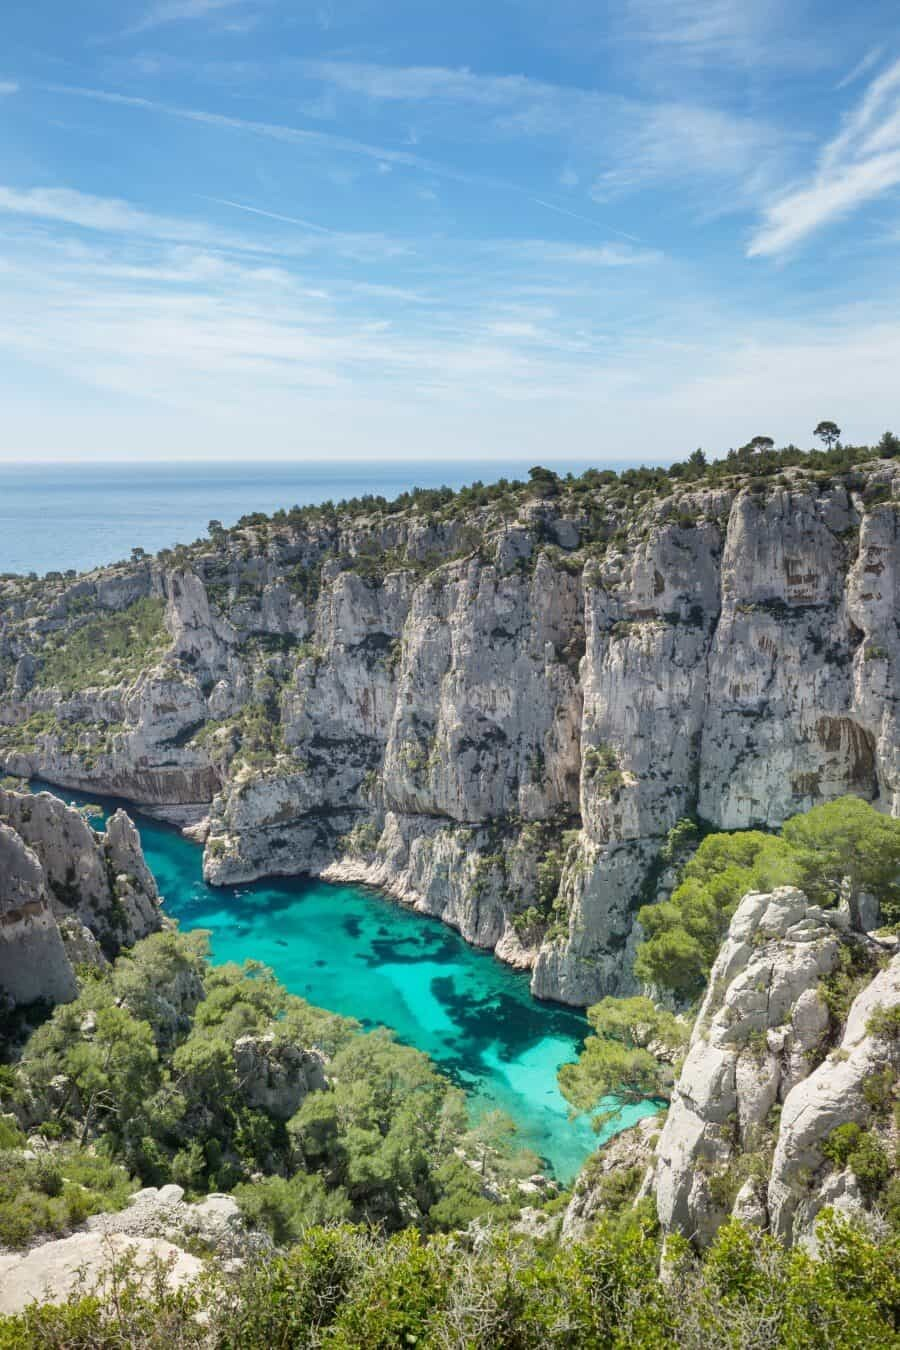 Calanque d'en Vau Places to Photograph in Provence, France